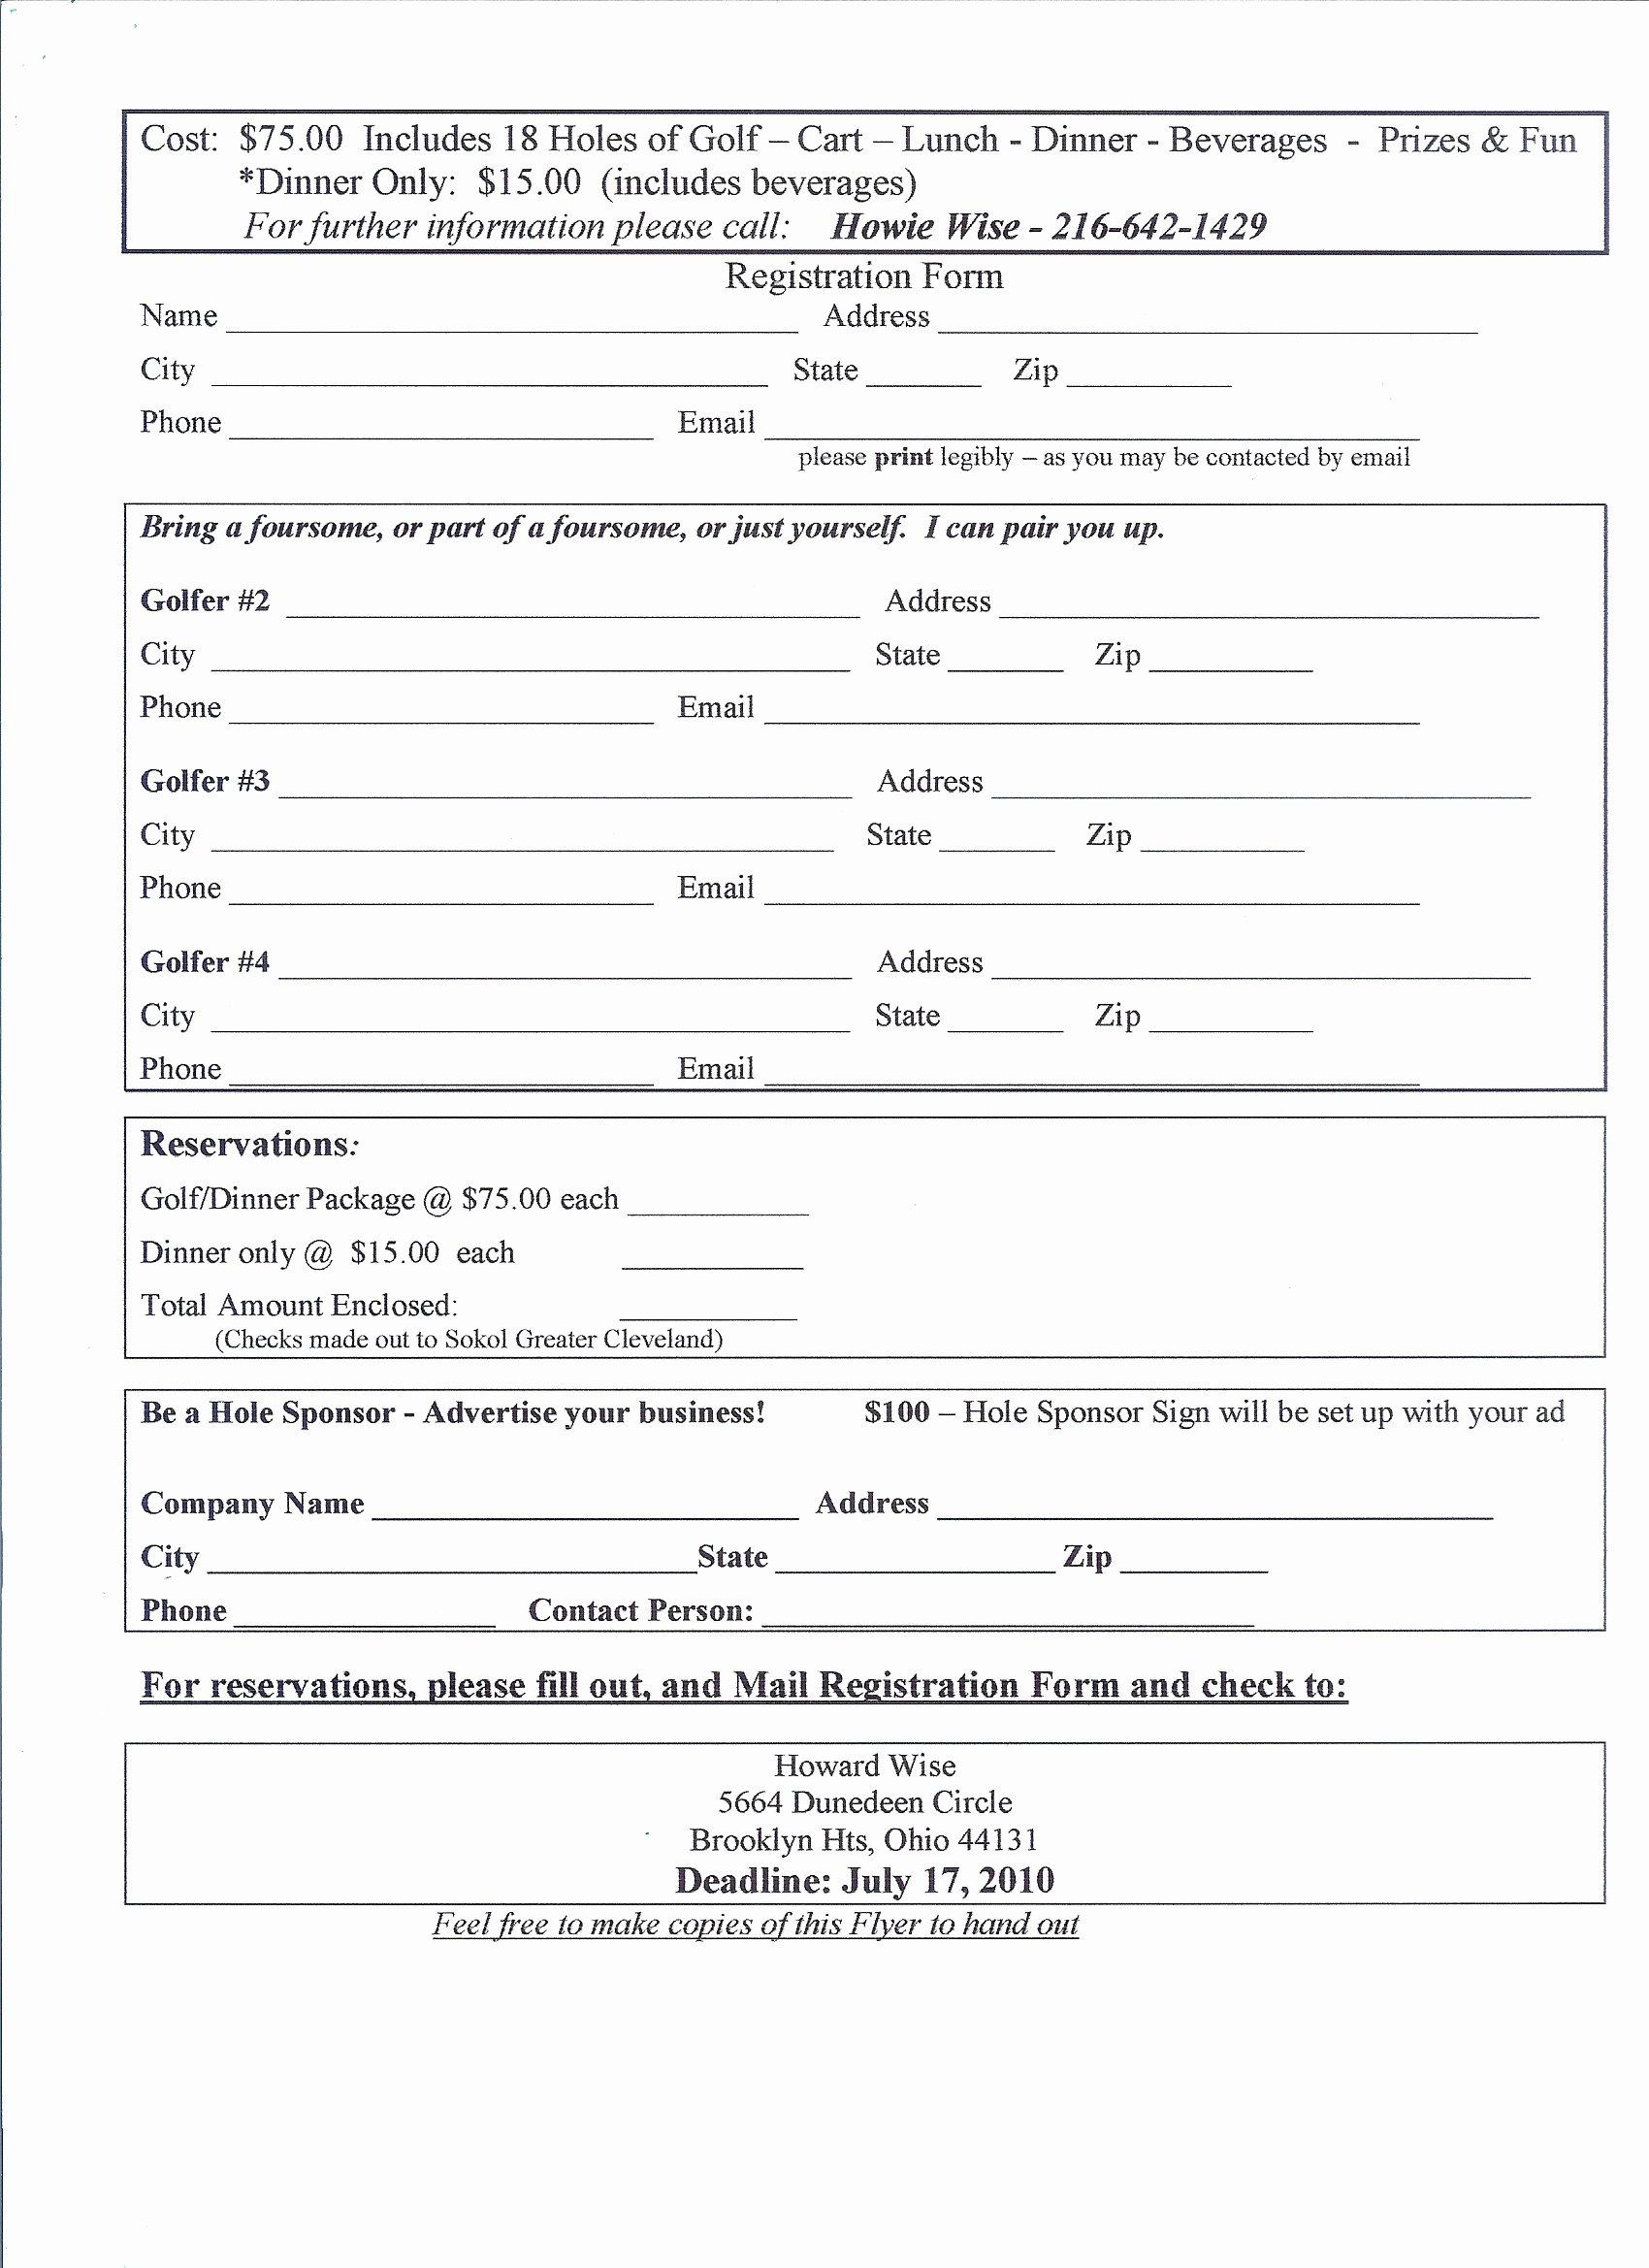 Free Registration form Template Beautiful Application form event Registration form Template Printable